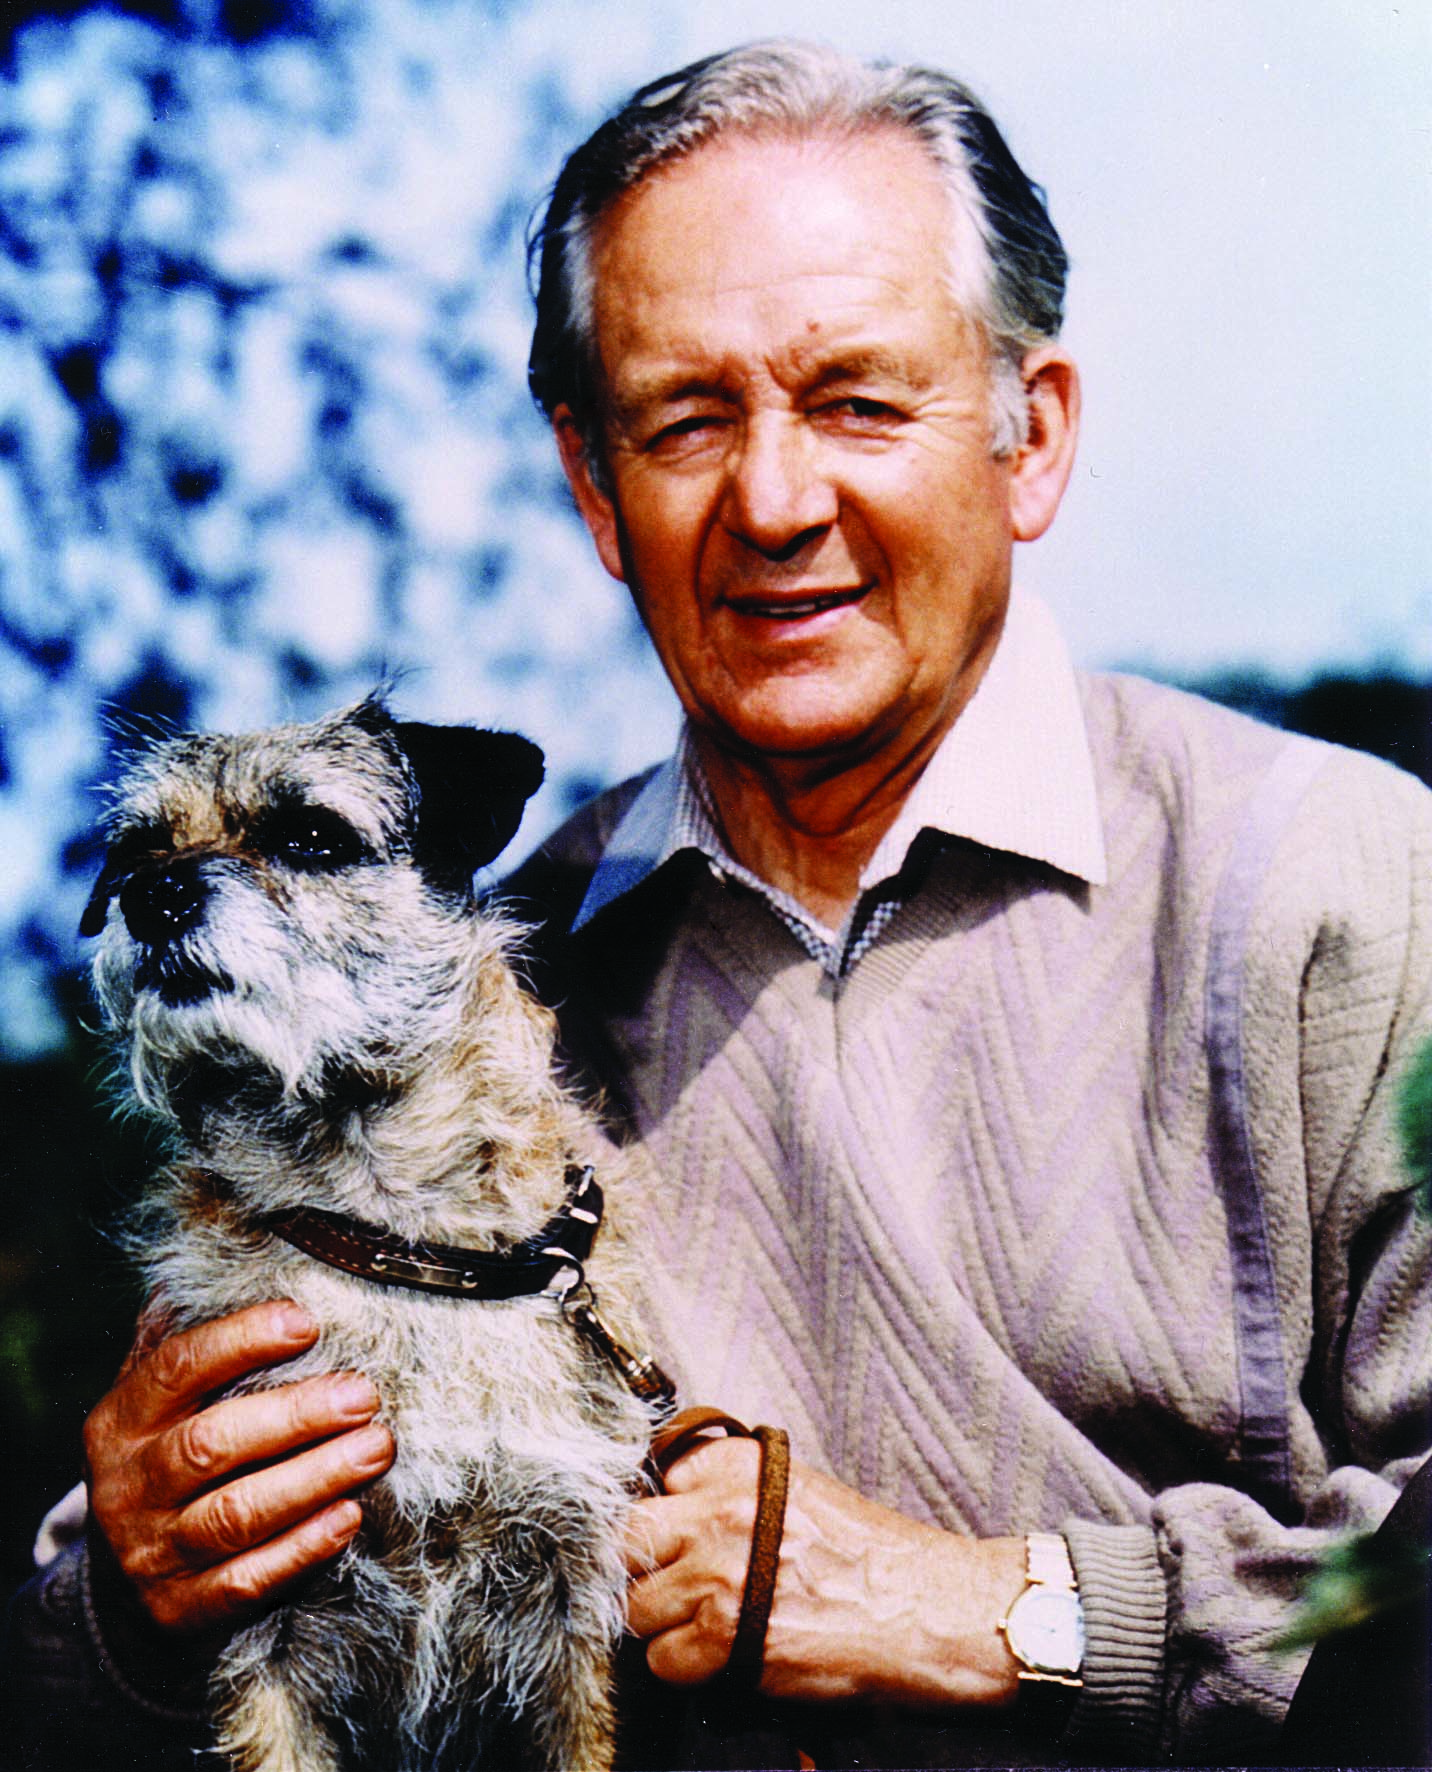 centenary anniversary year of alf wight james herriot hello alf wight james herriot with his dog